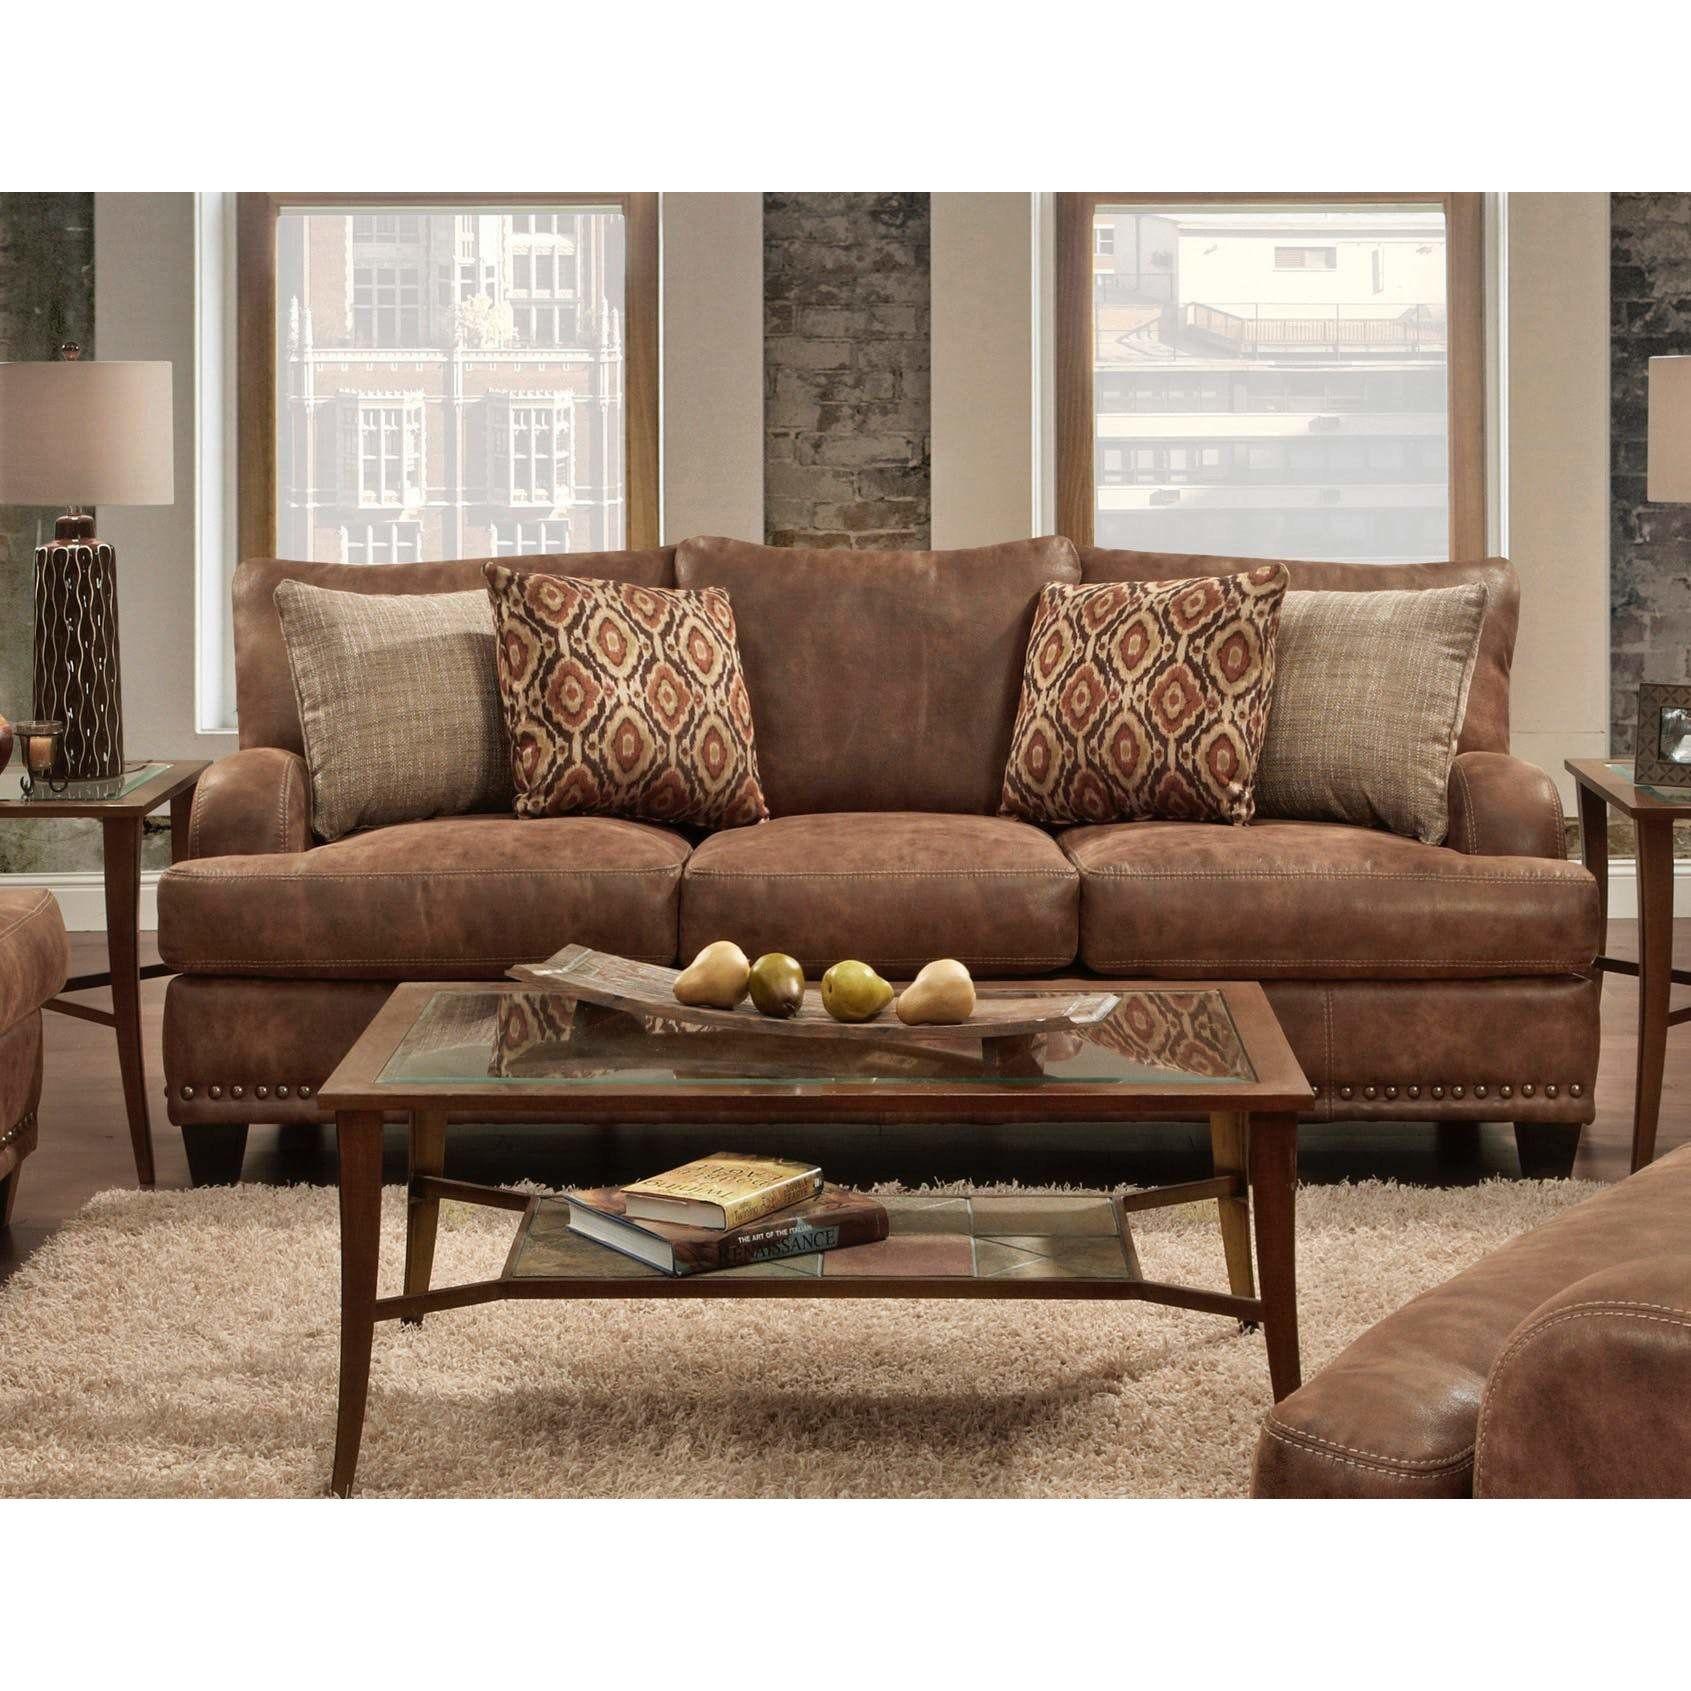 Indira Sofa In 2021 Living Room Decor Furniture Brown Living Room